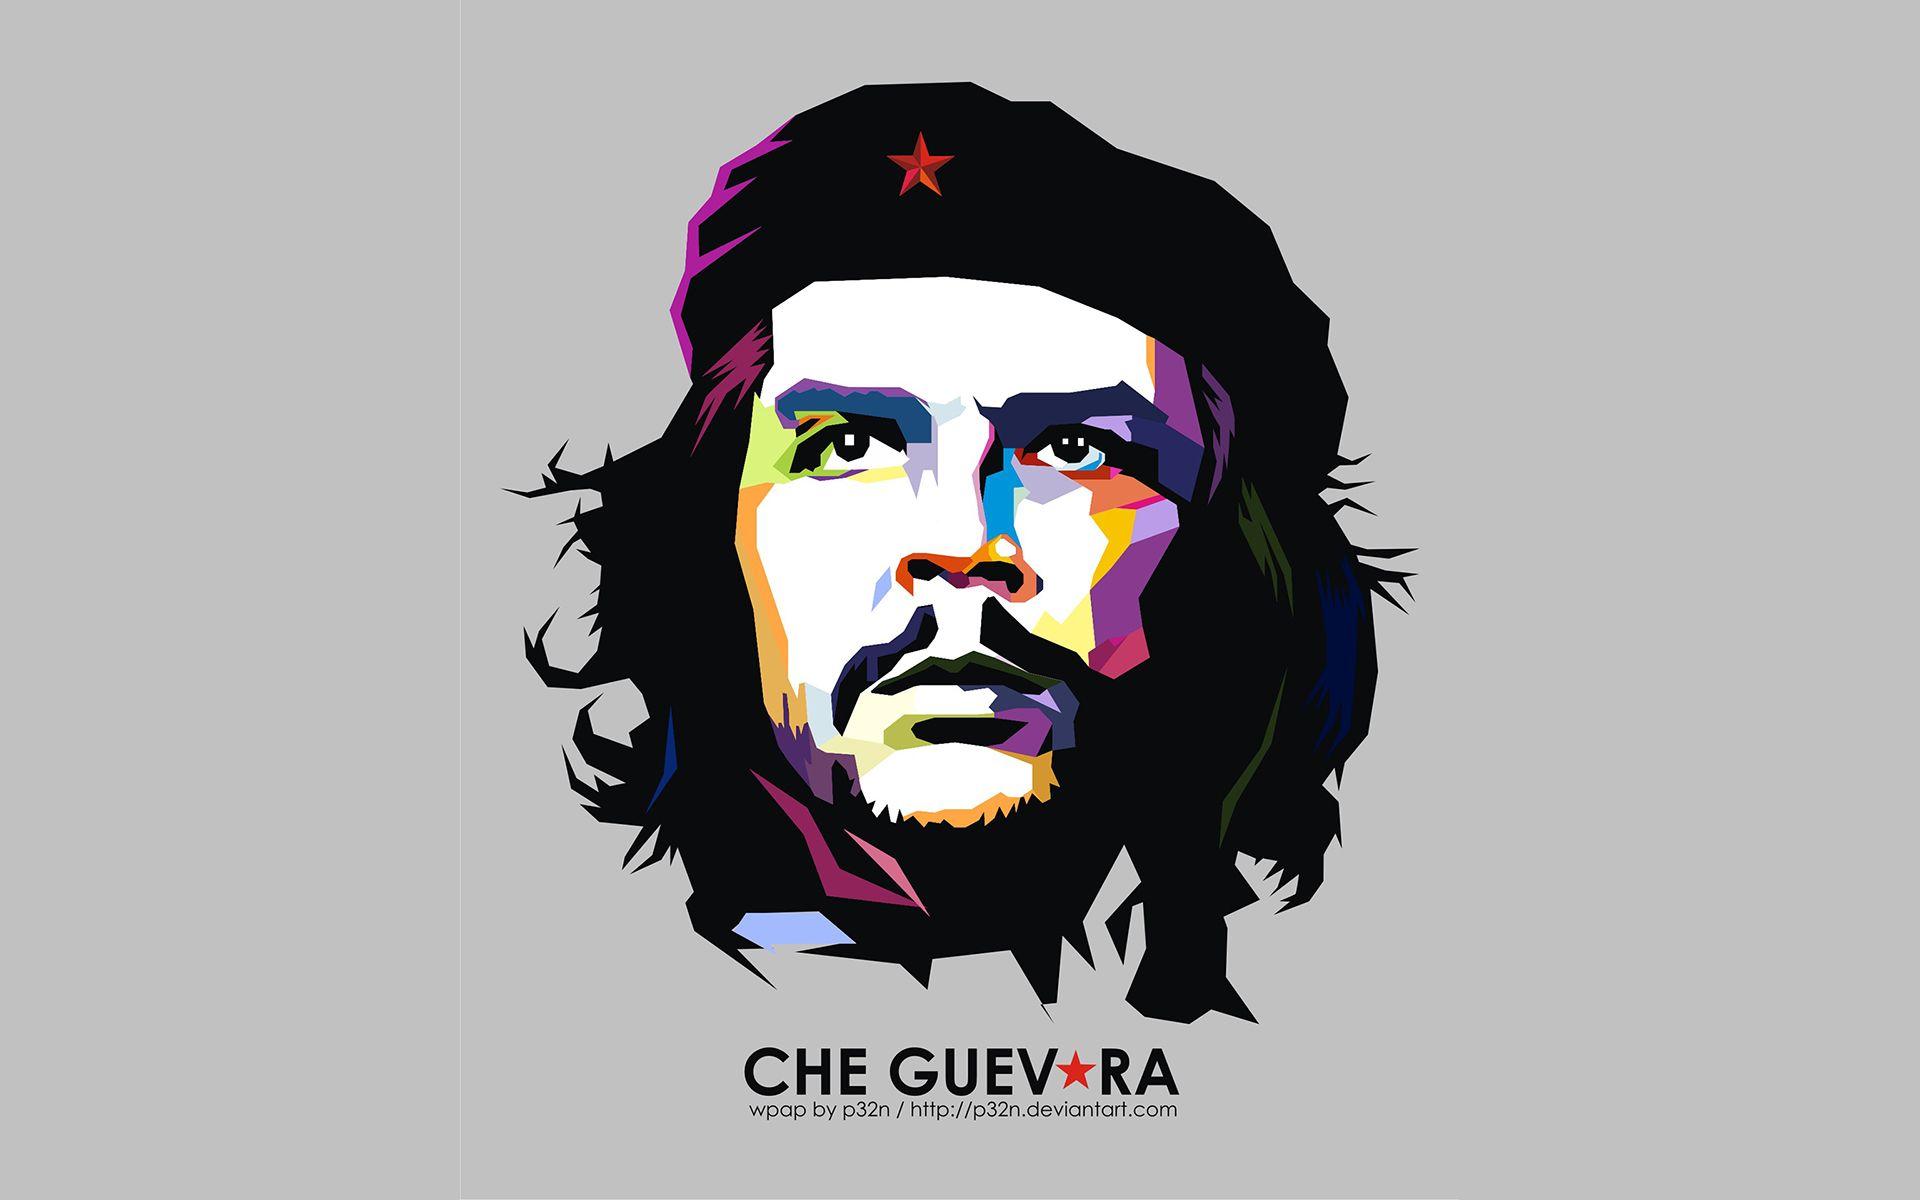 Che Guevara On Wpap Design Free Desktop Hd Wallpaper Wpap Art Che Guevara Art Ernesto Che